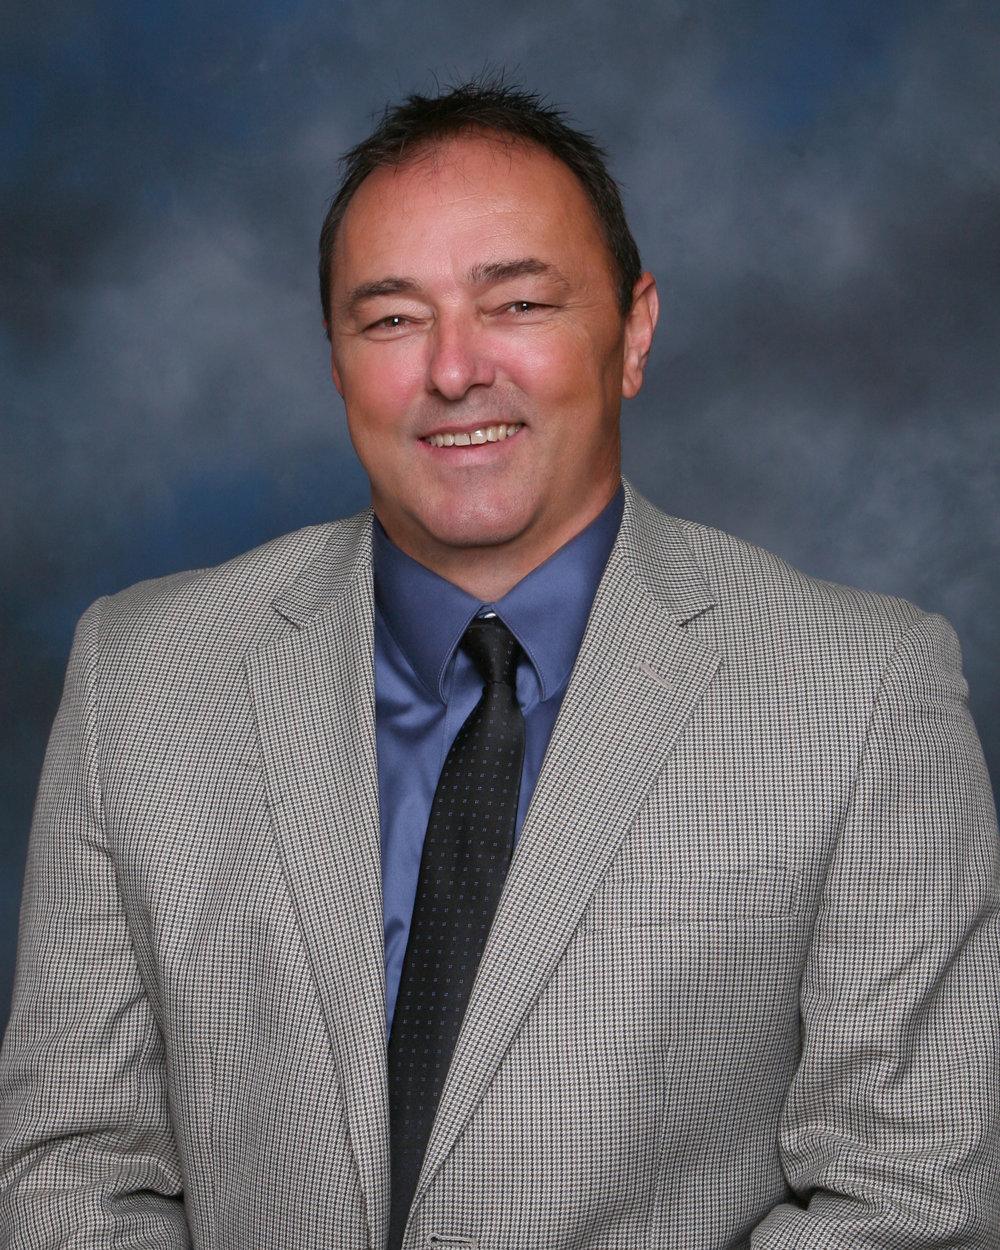 Tony Cornner - Professional Development